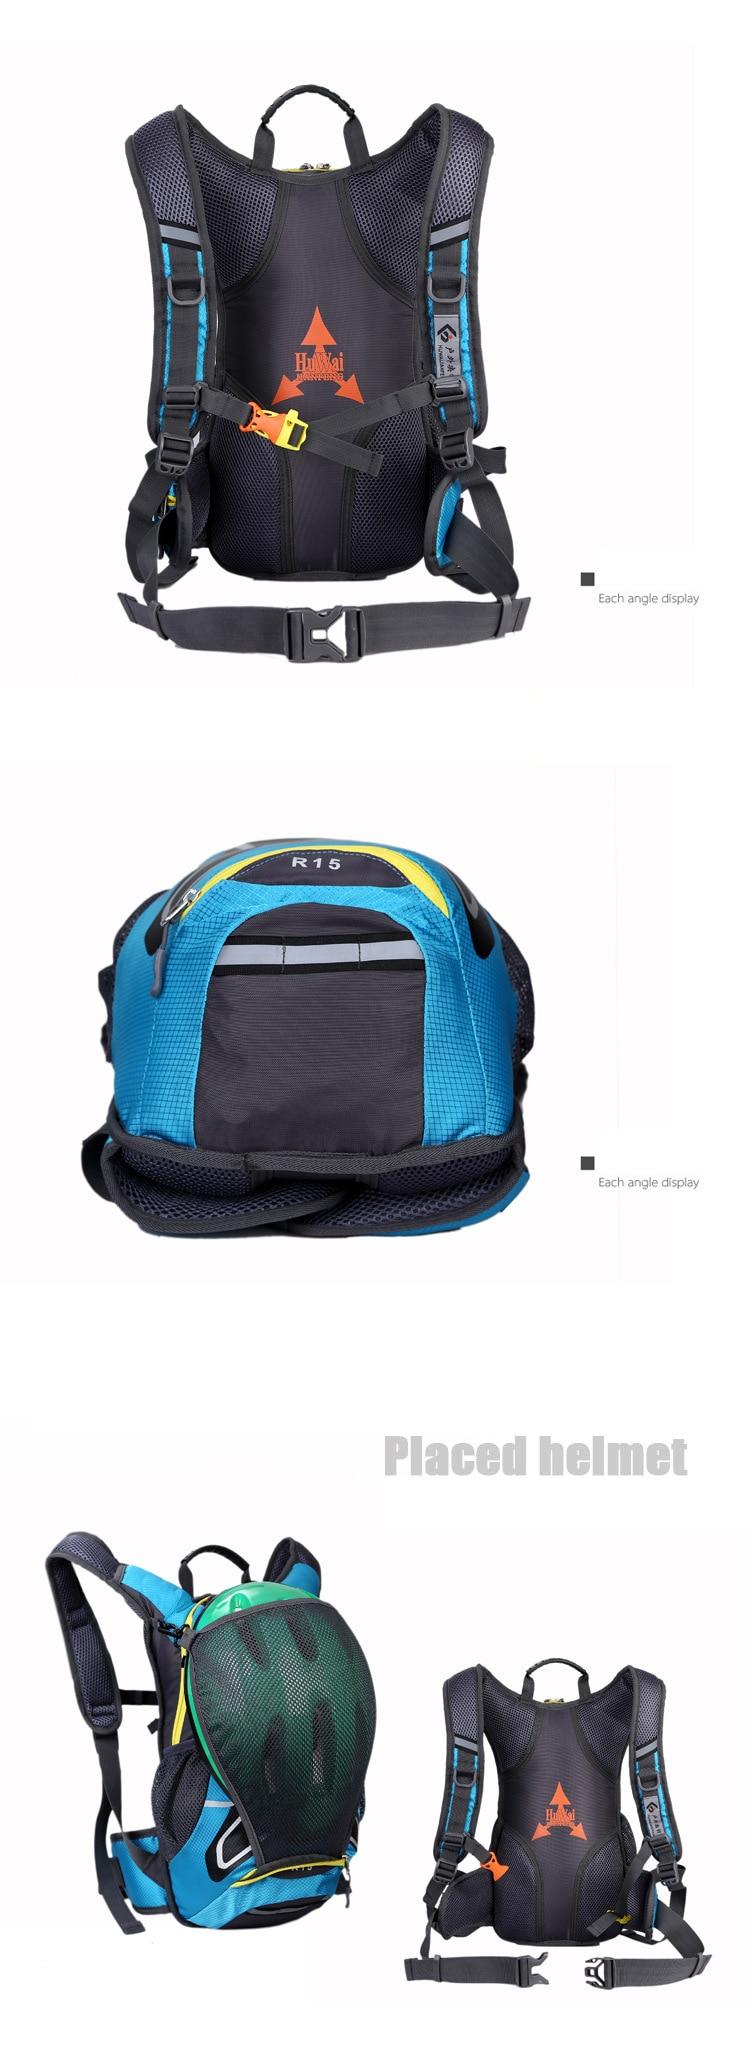 Bolsa impermeável para capacete de motocicleta, sacola